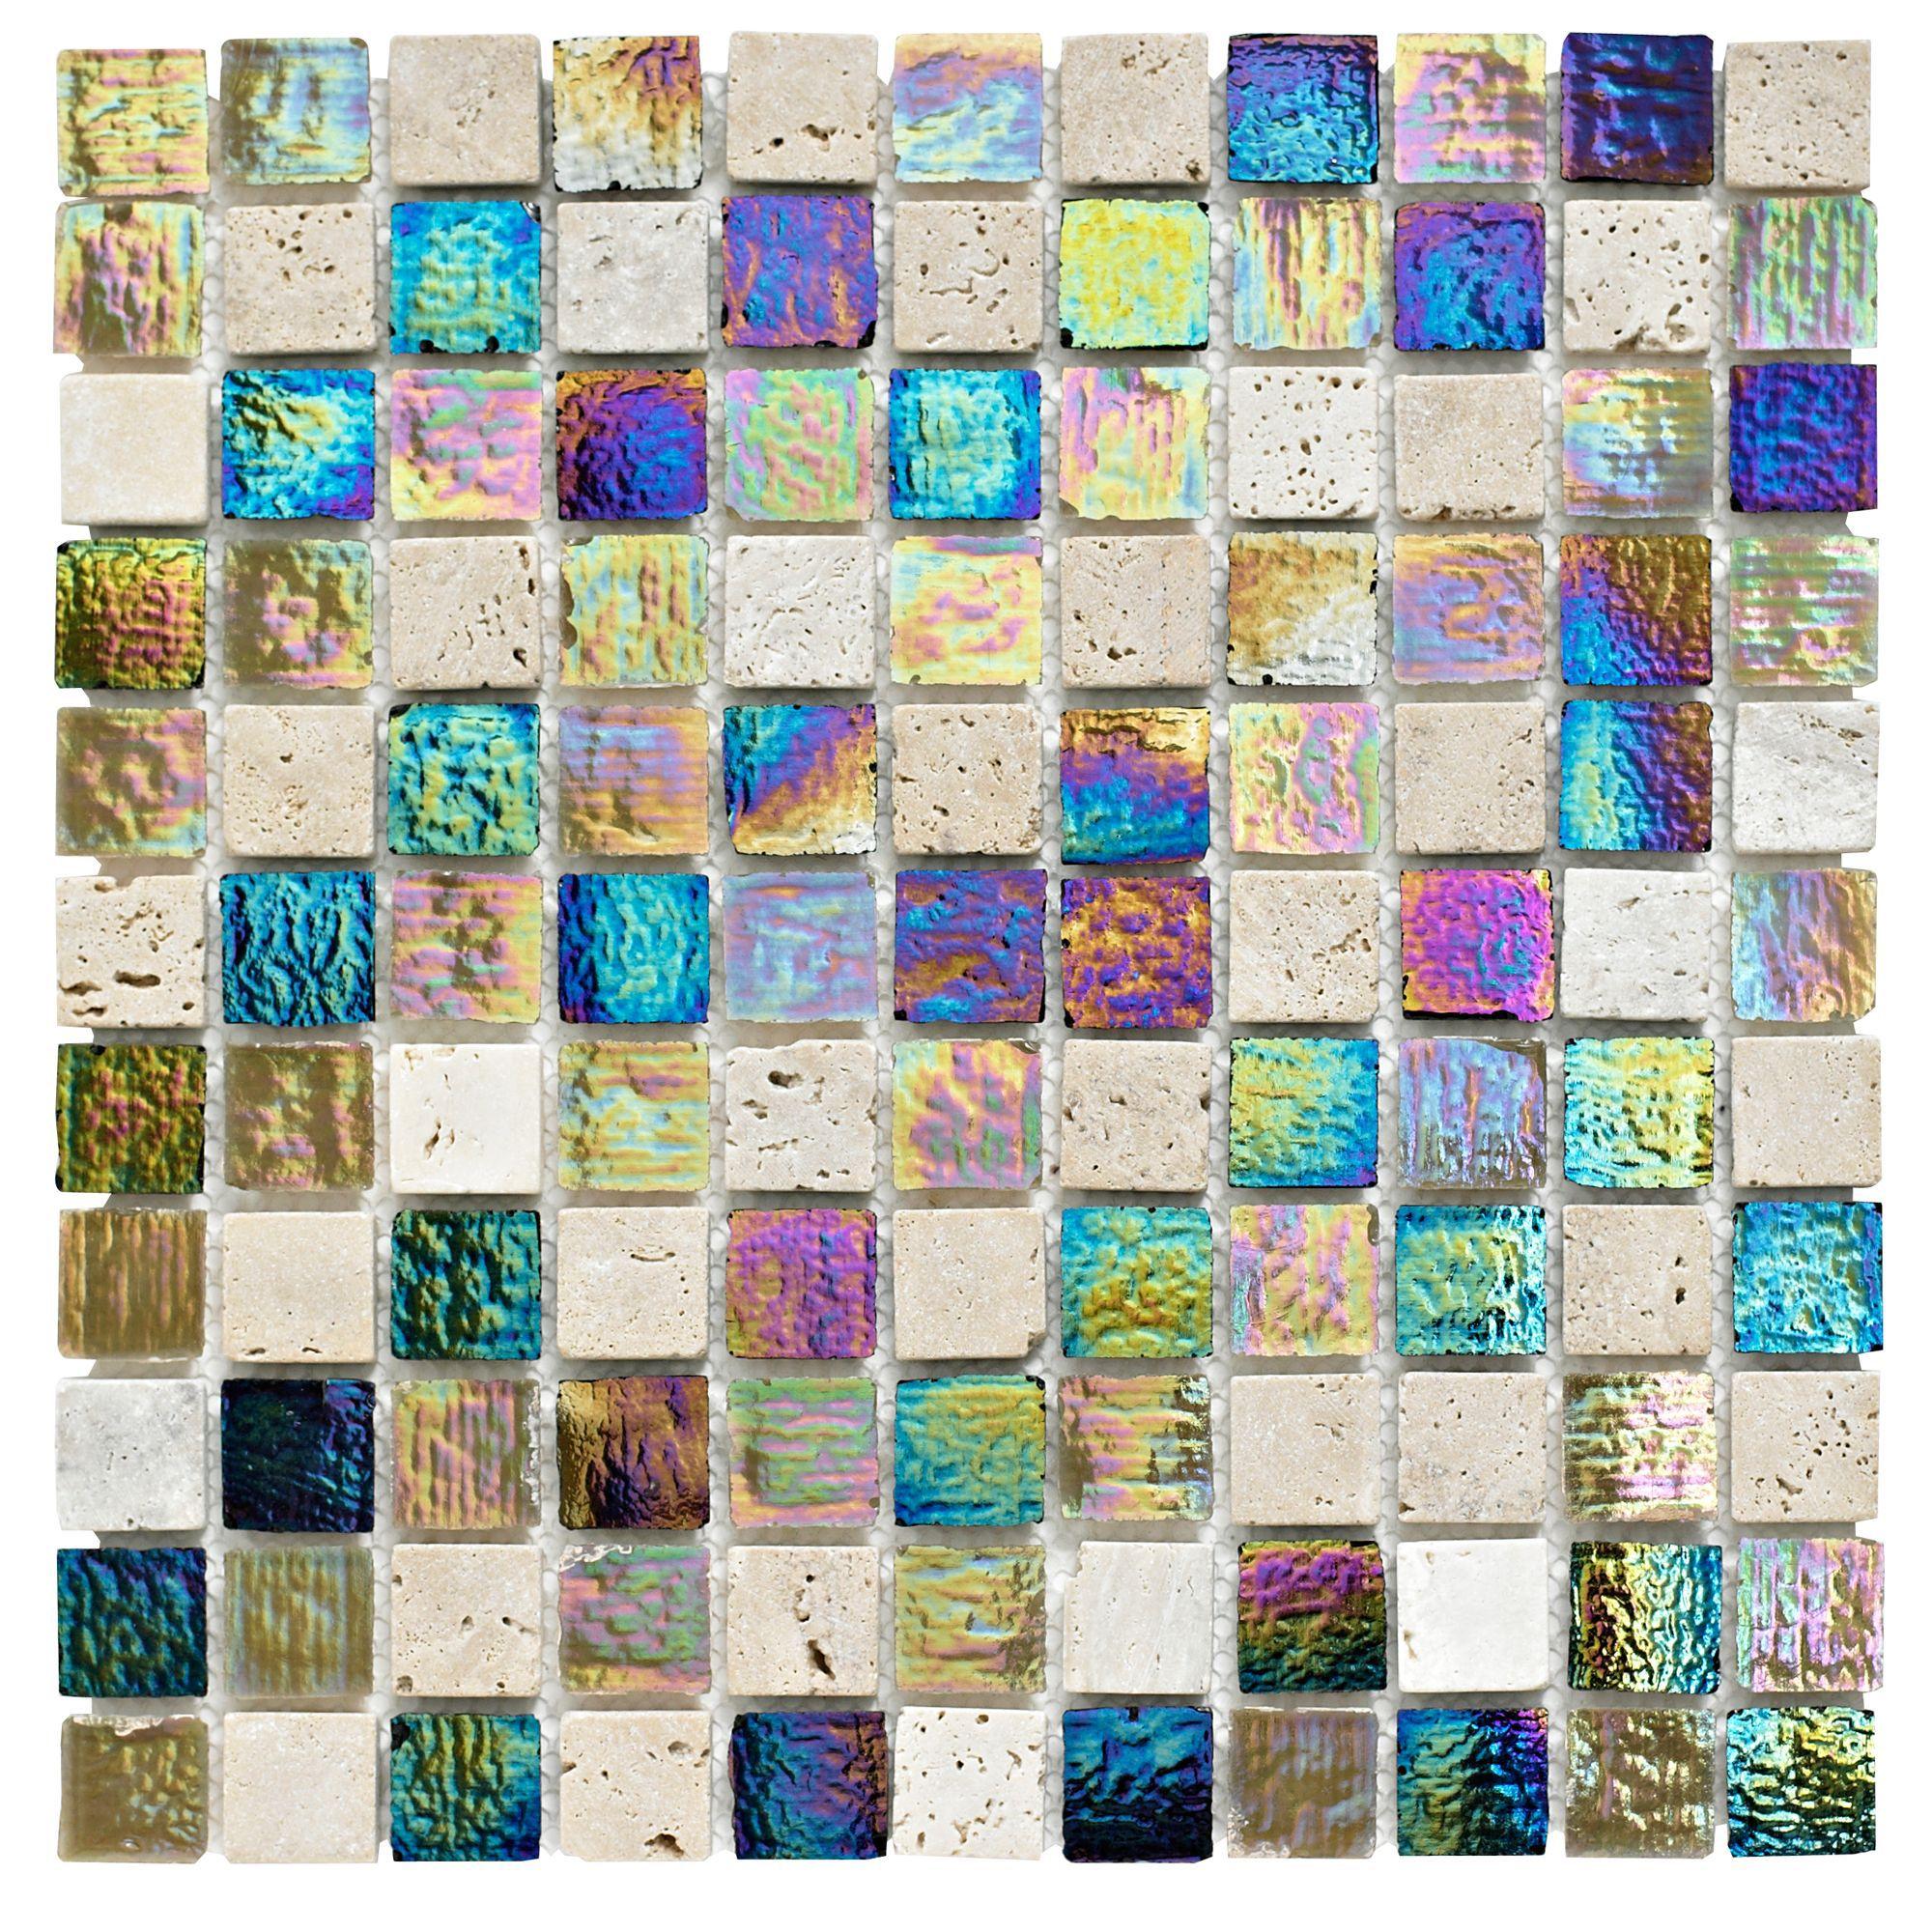 mosaic bathroom tiles b and q askern cream glass mosaic tiles from